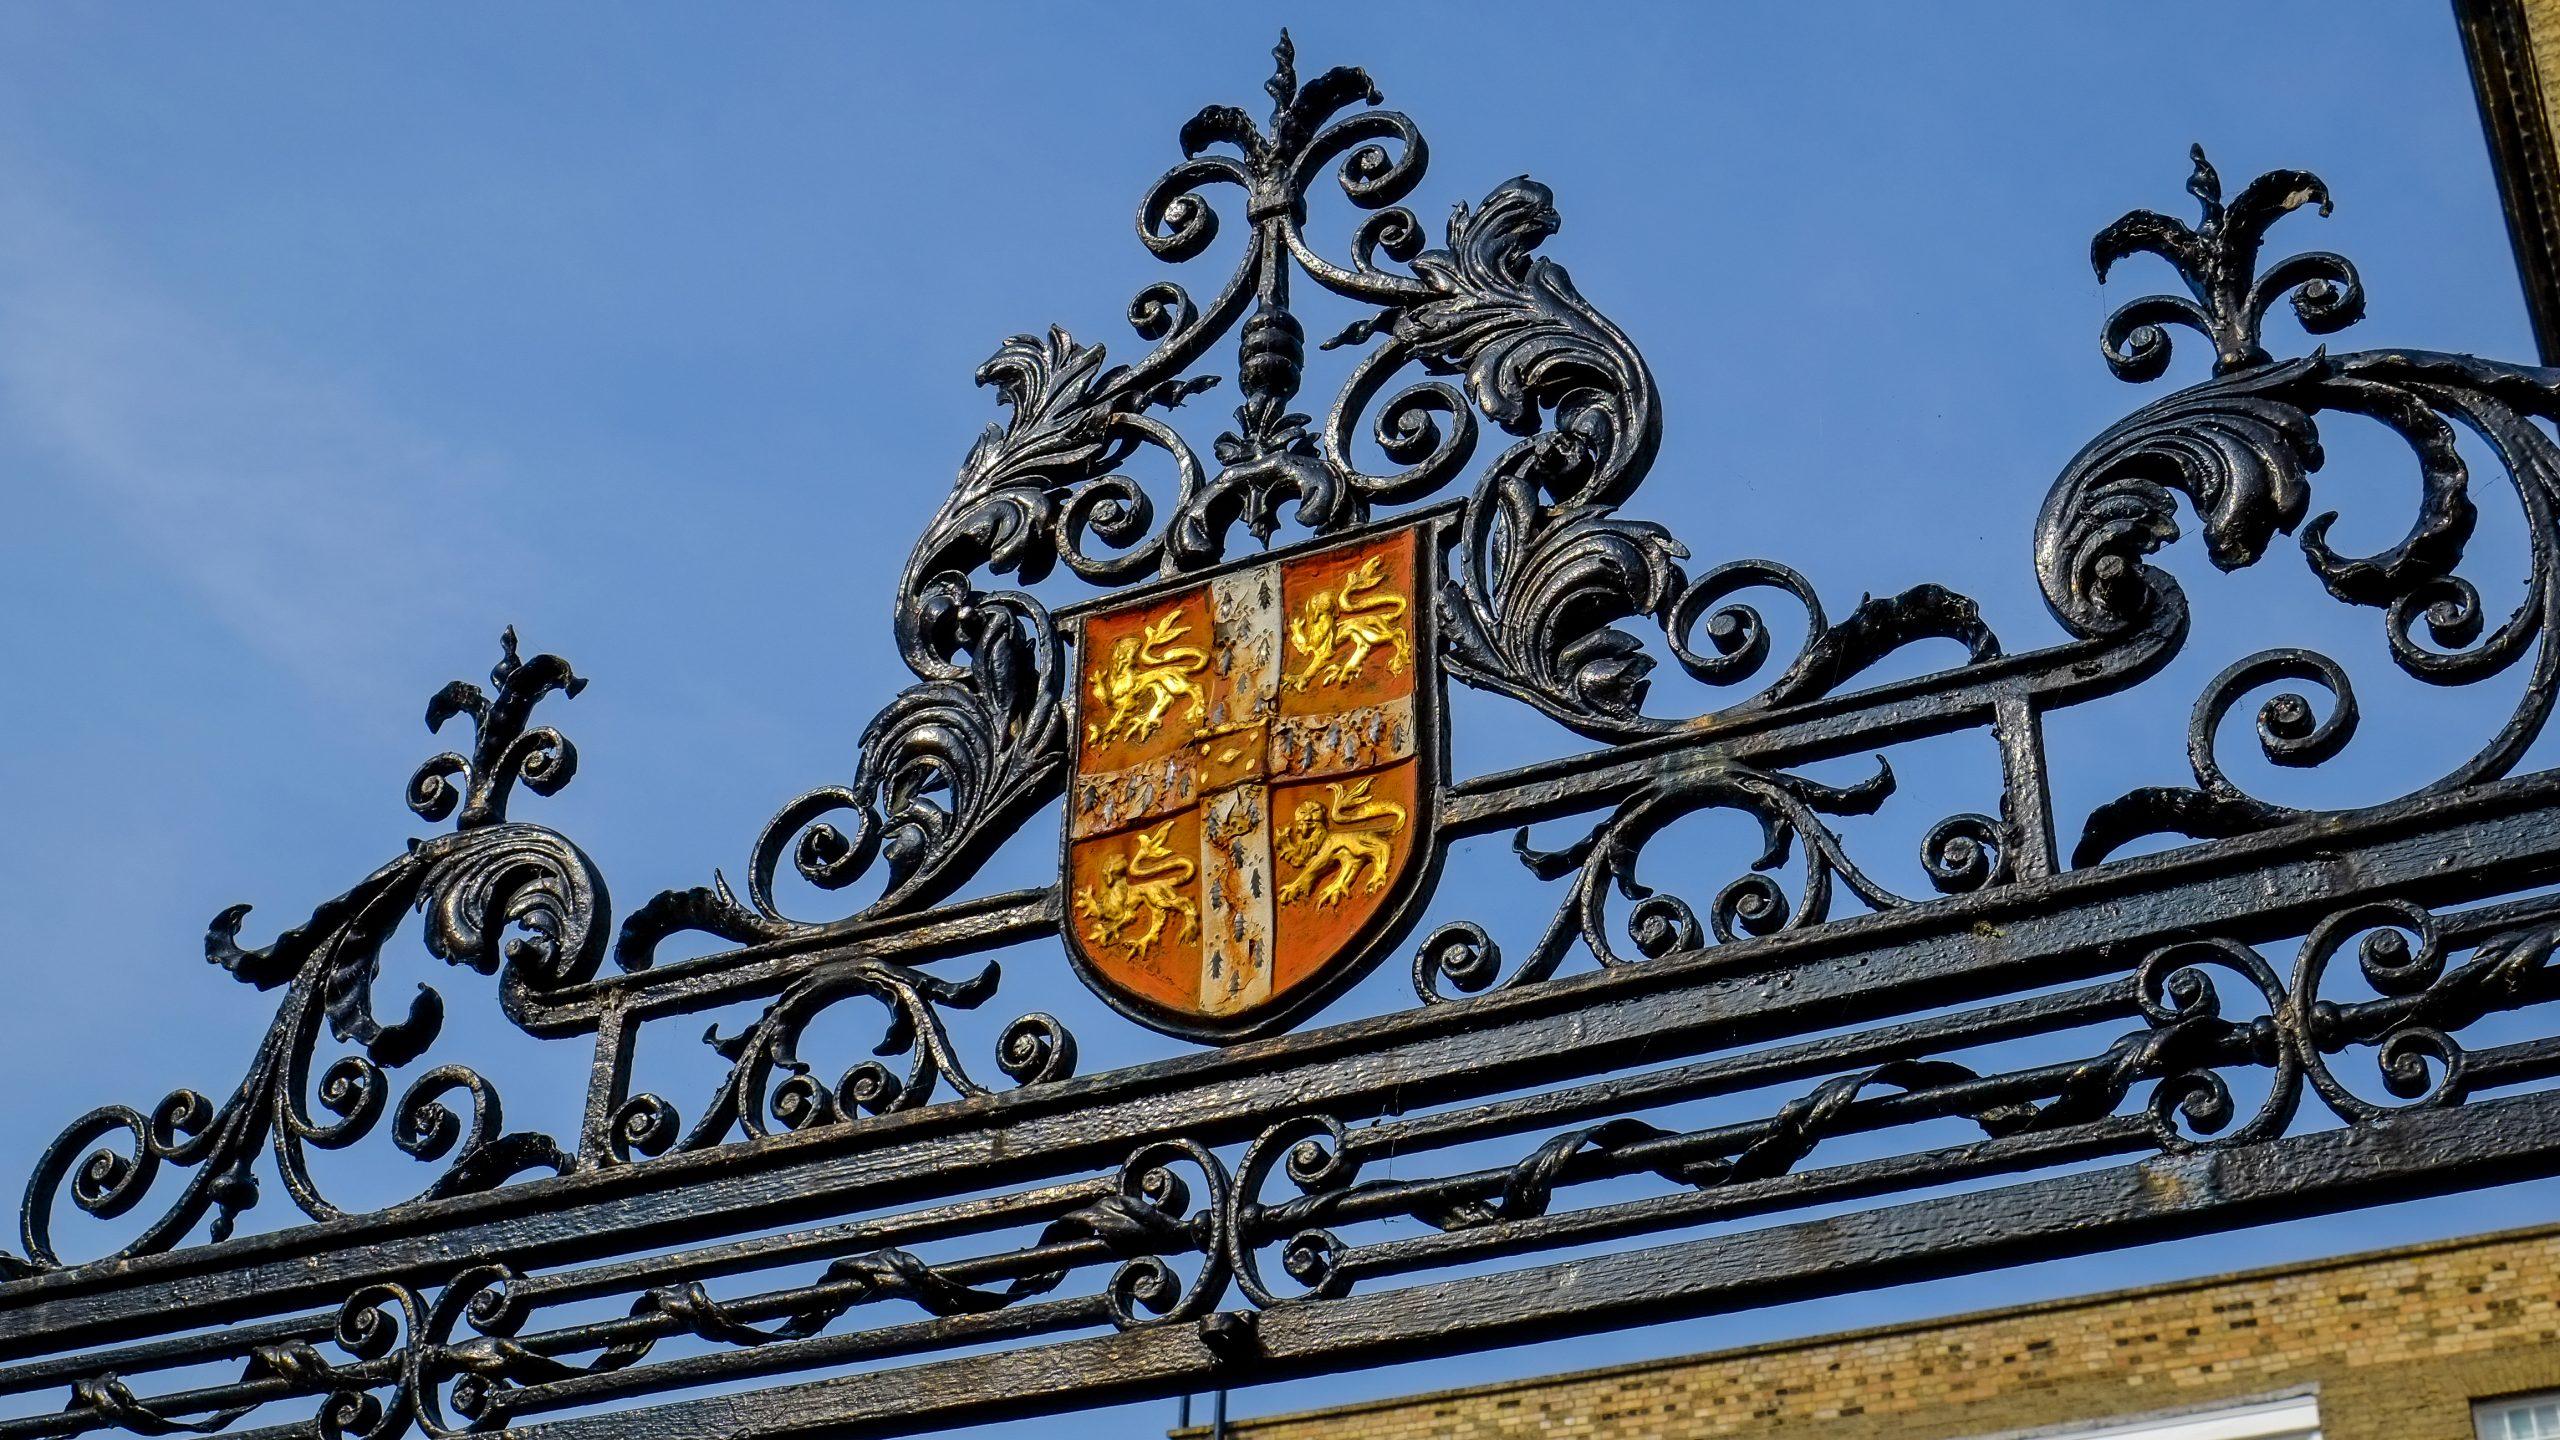 Gates Cambridge Class of 2017 announced